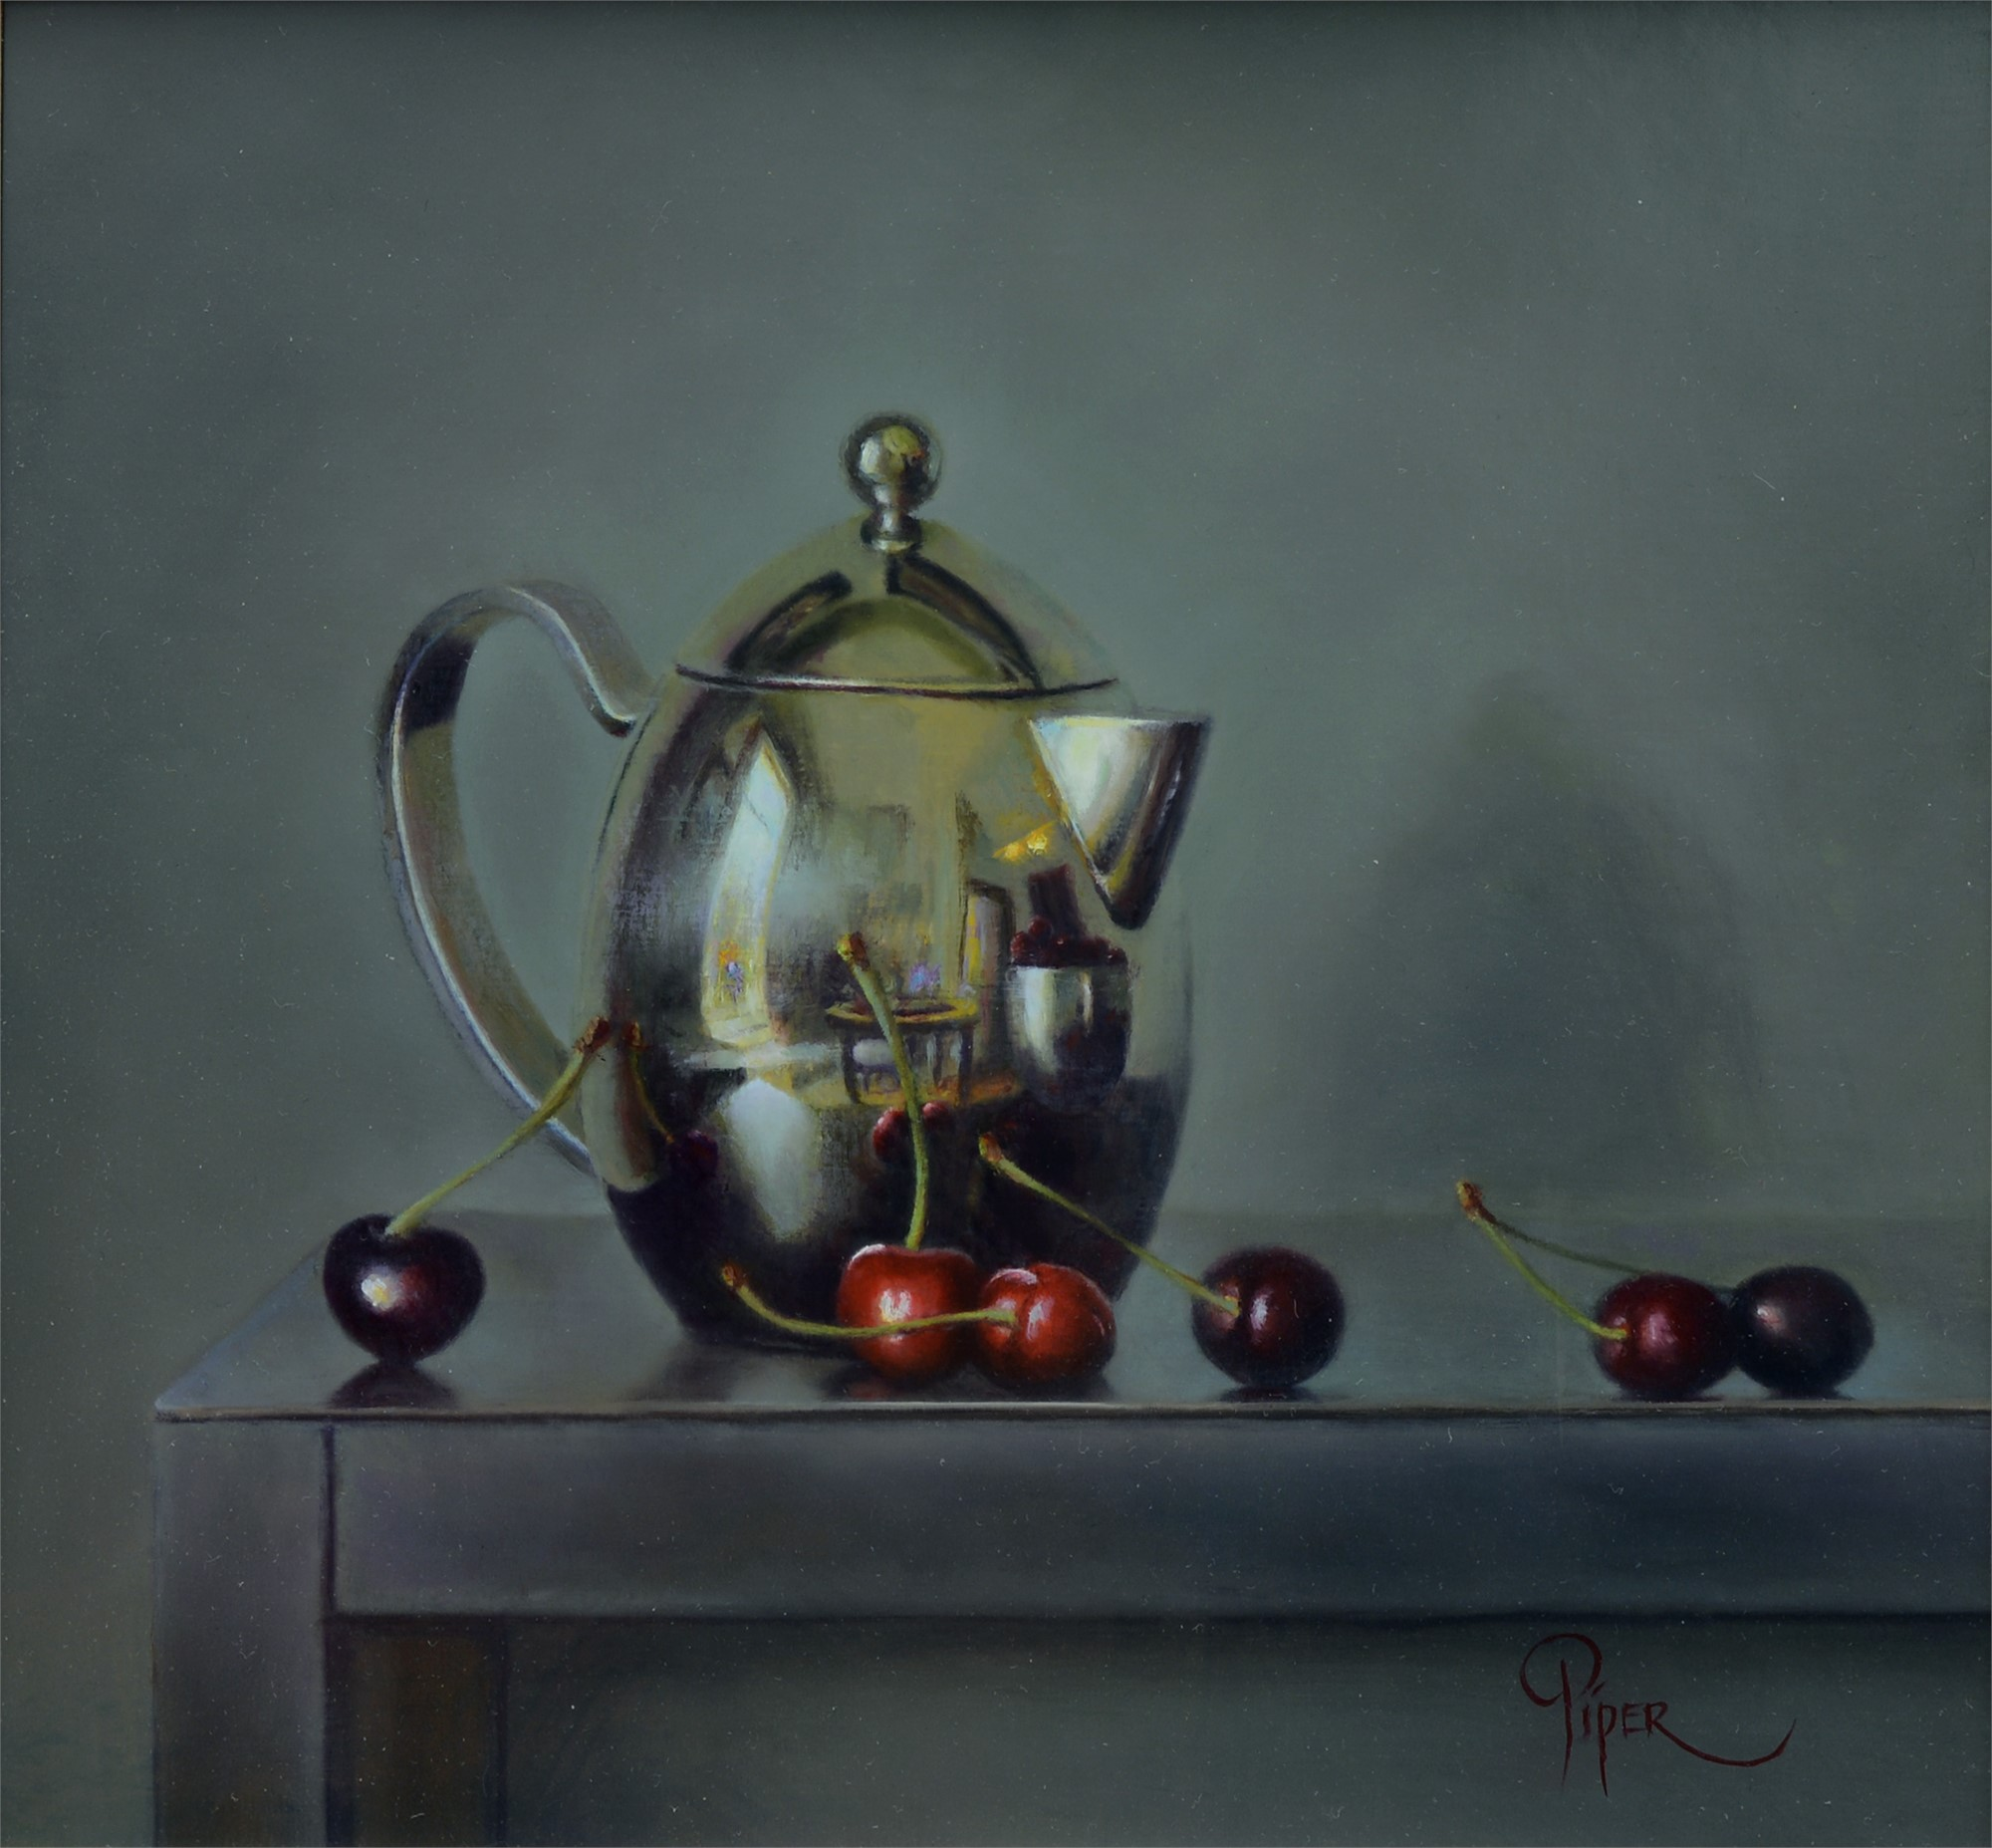 Cherries and Tea by Marsha Whitesides Piper